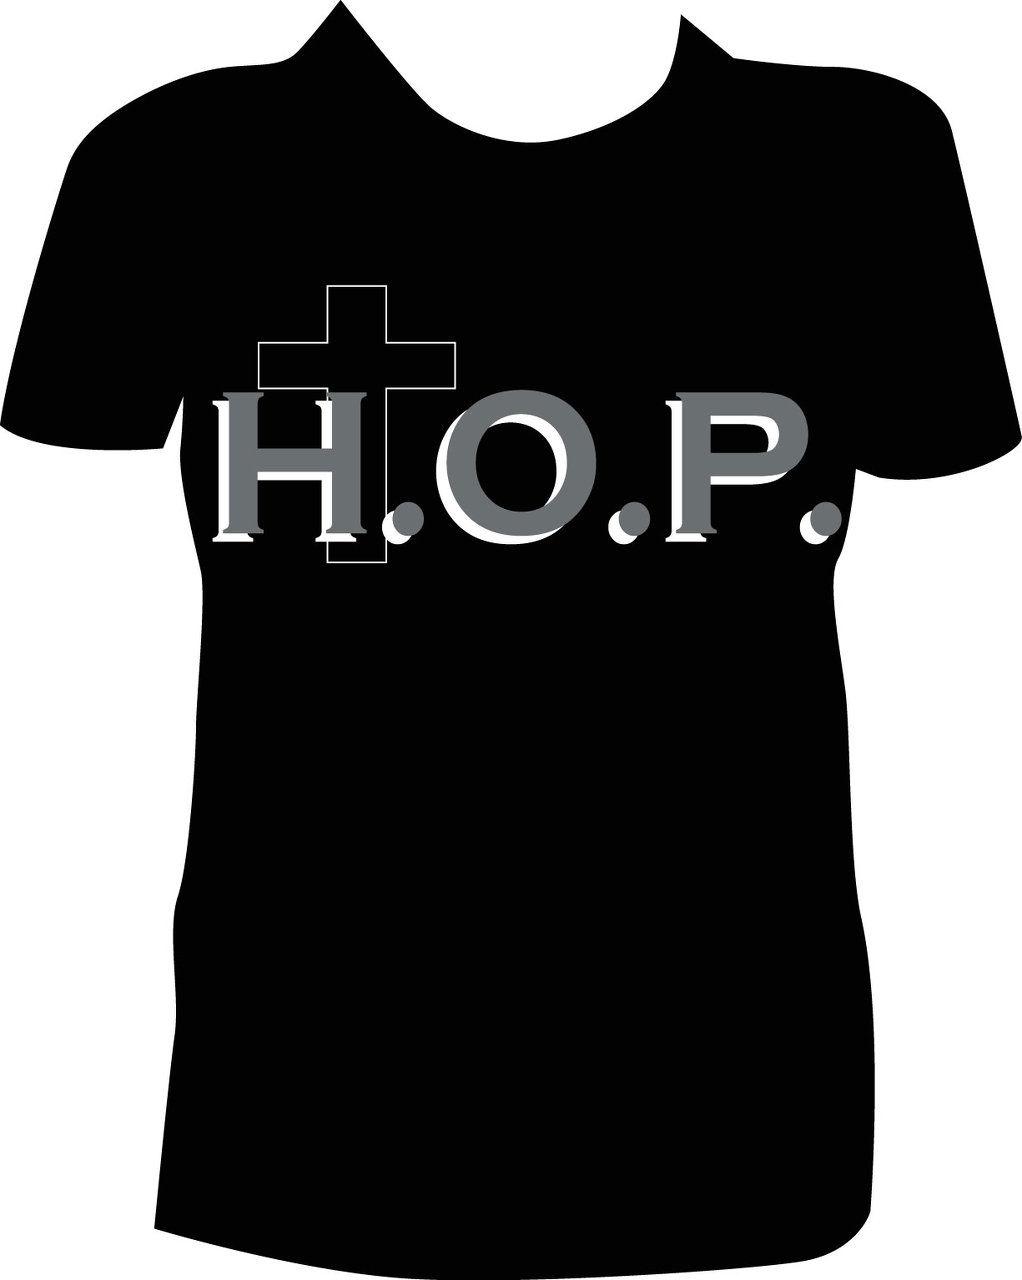 HOP shirt1.jpg